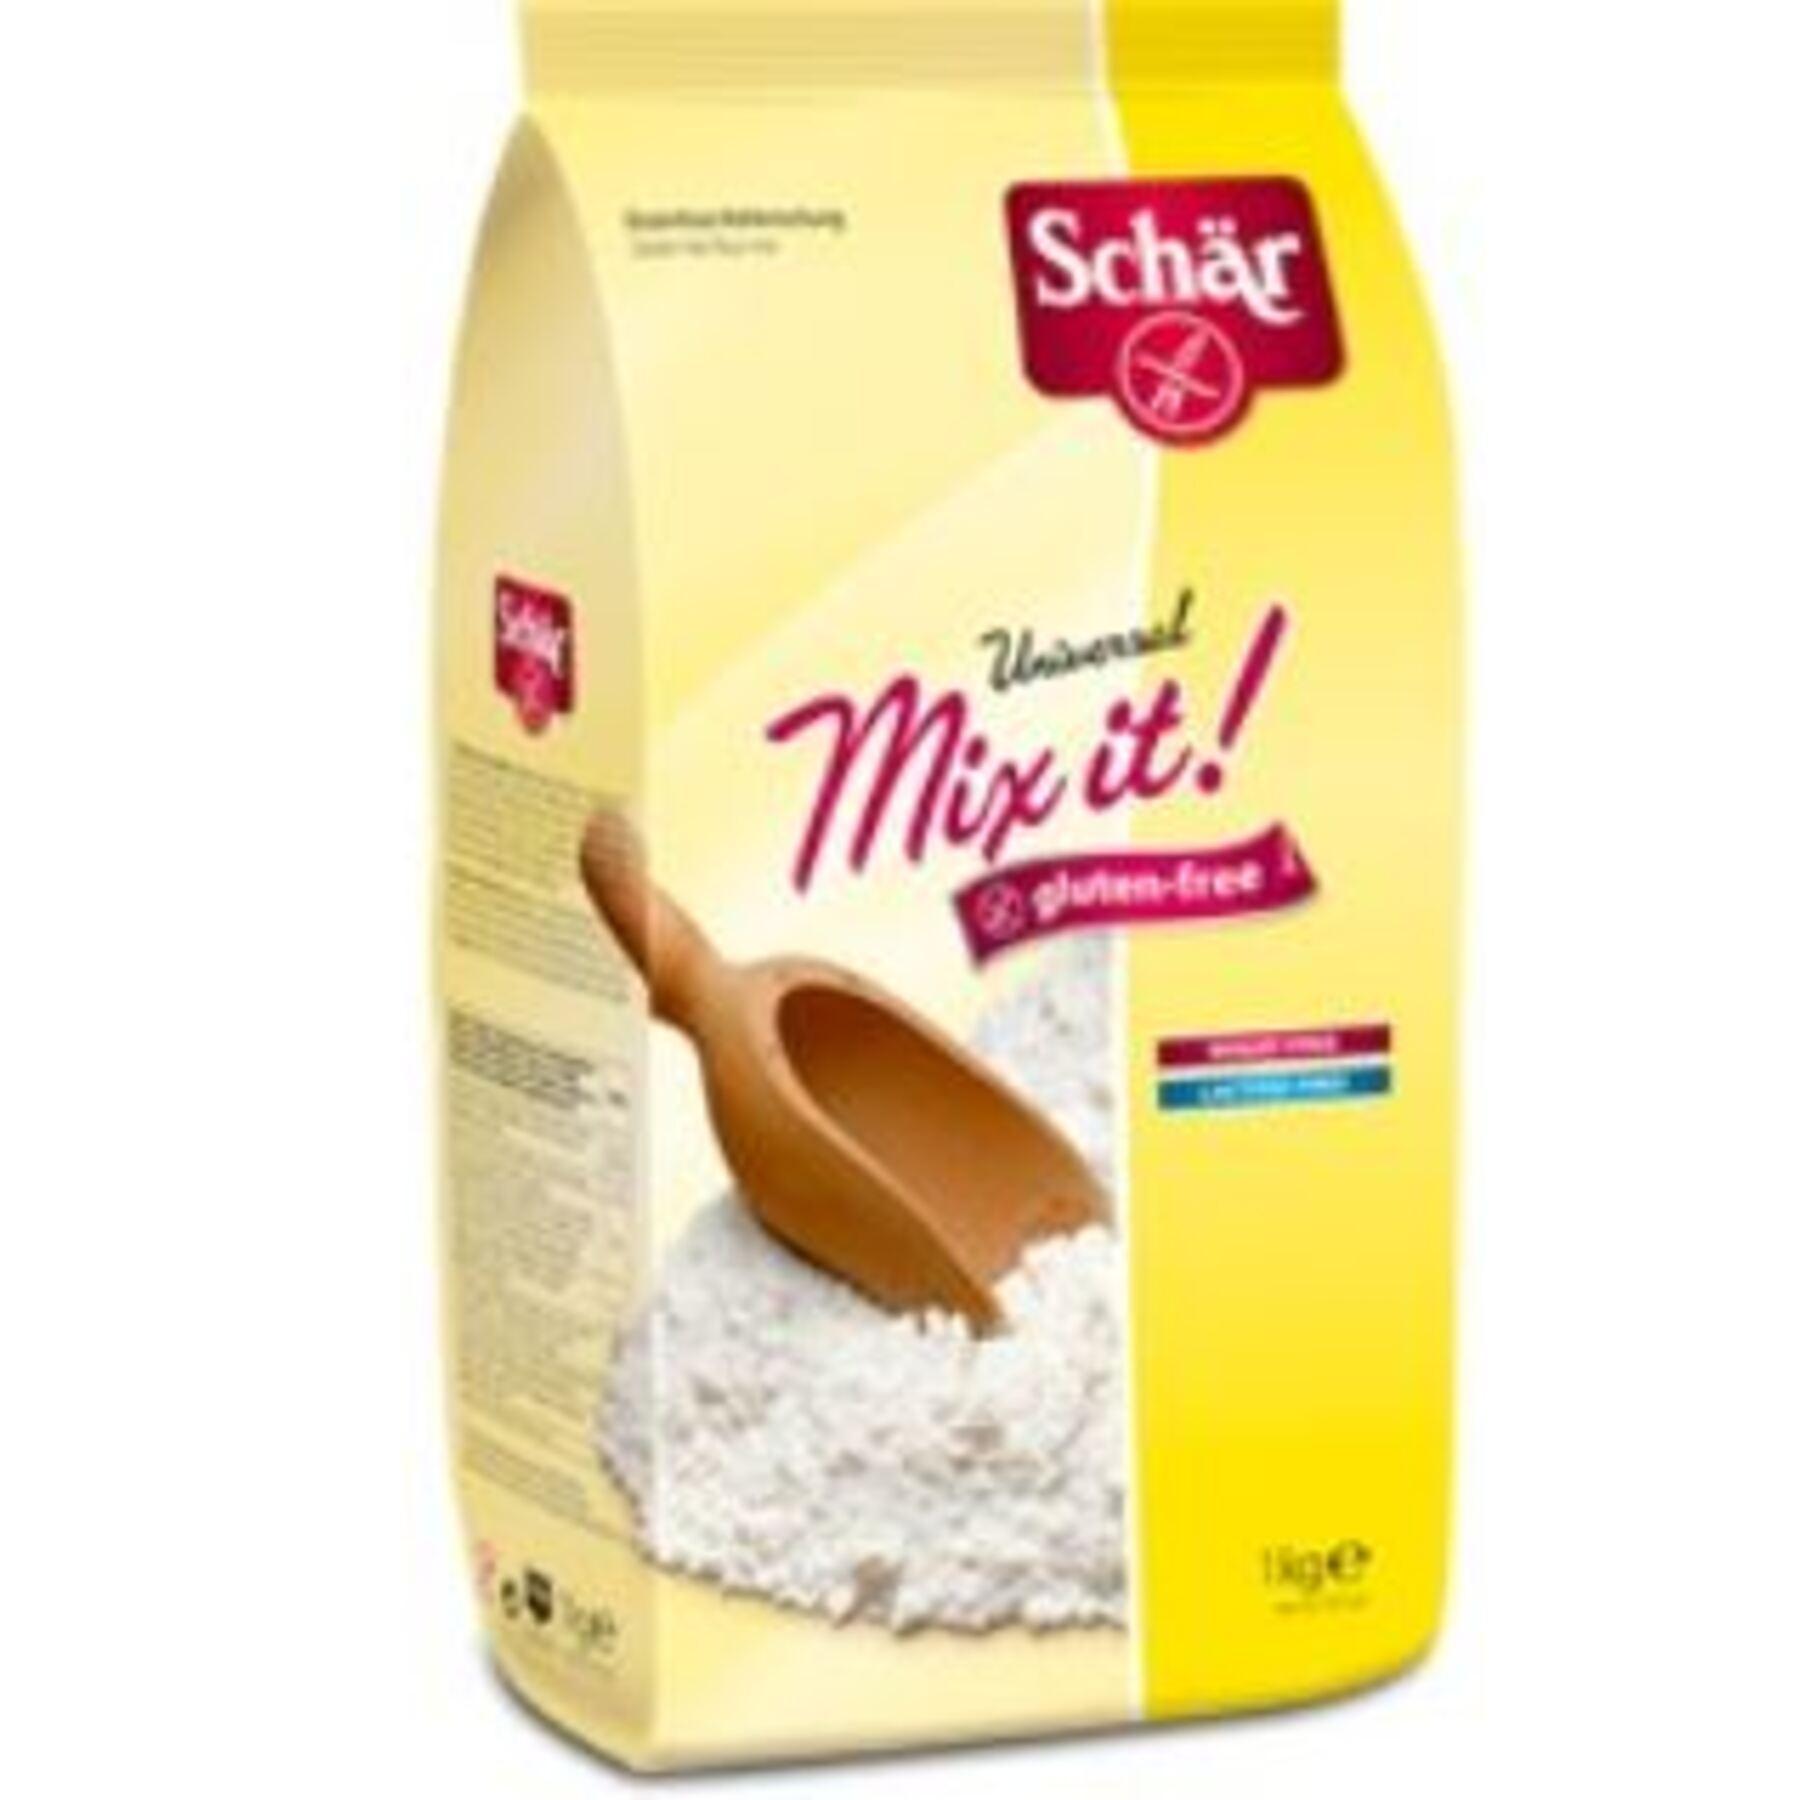 dr.schar spa schar mix it farina universale 1 kg